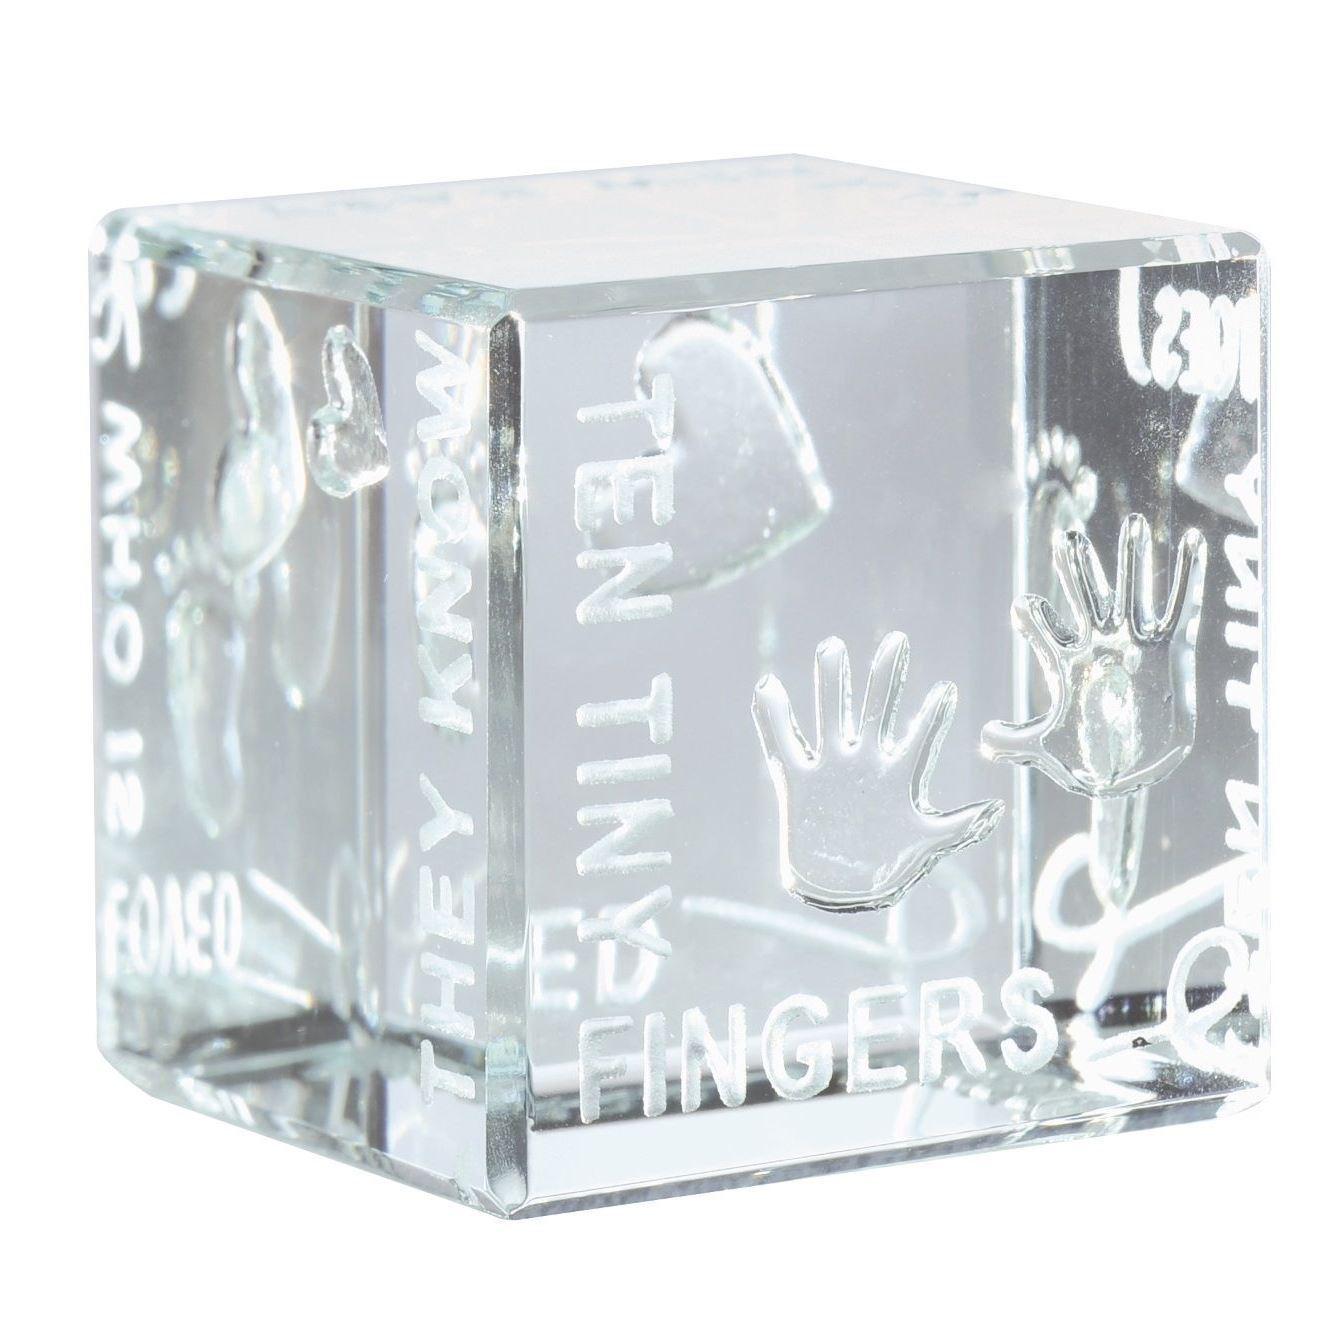 Spaceform Glass Godchild Stars /& Hearts Mini Cube Christening Keepsake Gift